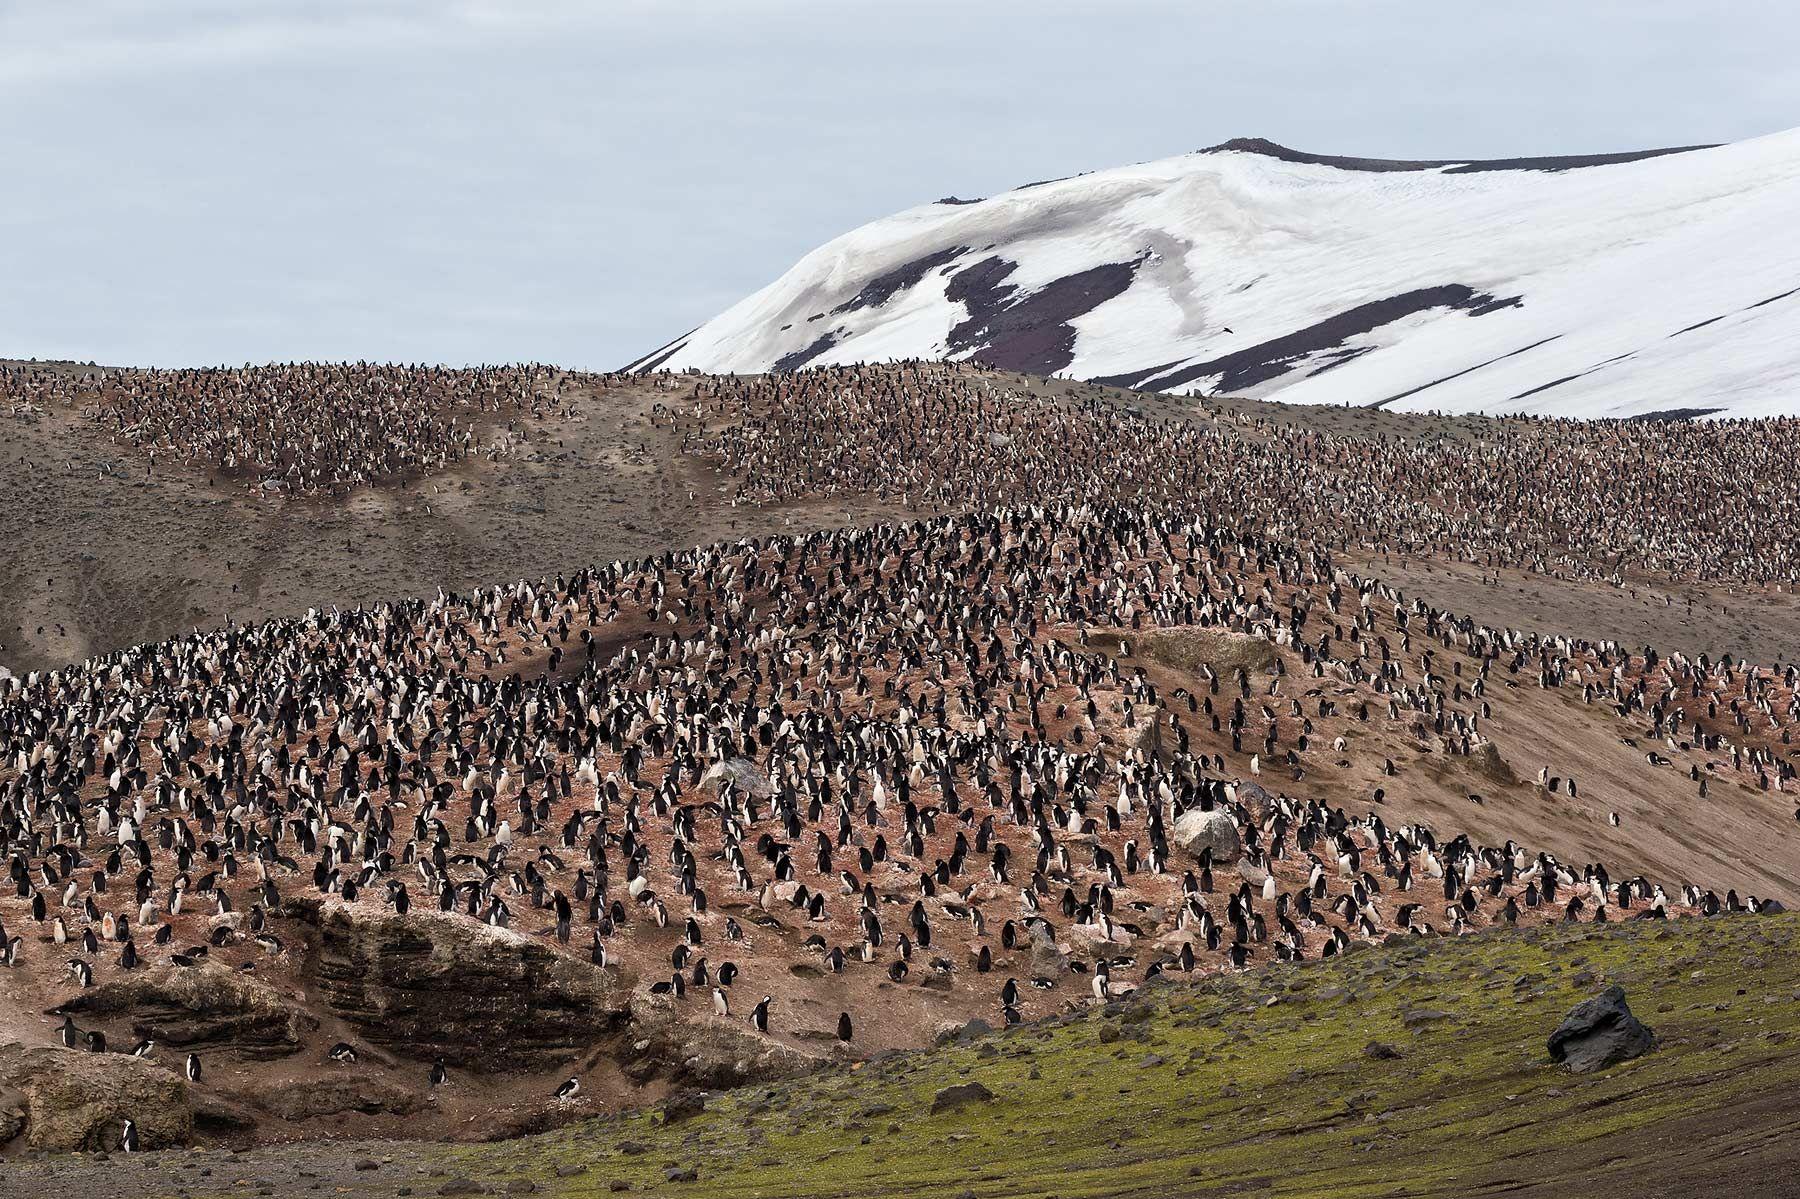 Chinstrap-Colony-at-Bailey-Head_E7T3910-Bailey-Head,-Deception-Island,-Antarctica.jpg